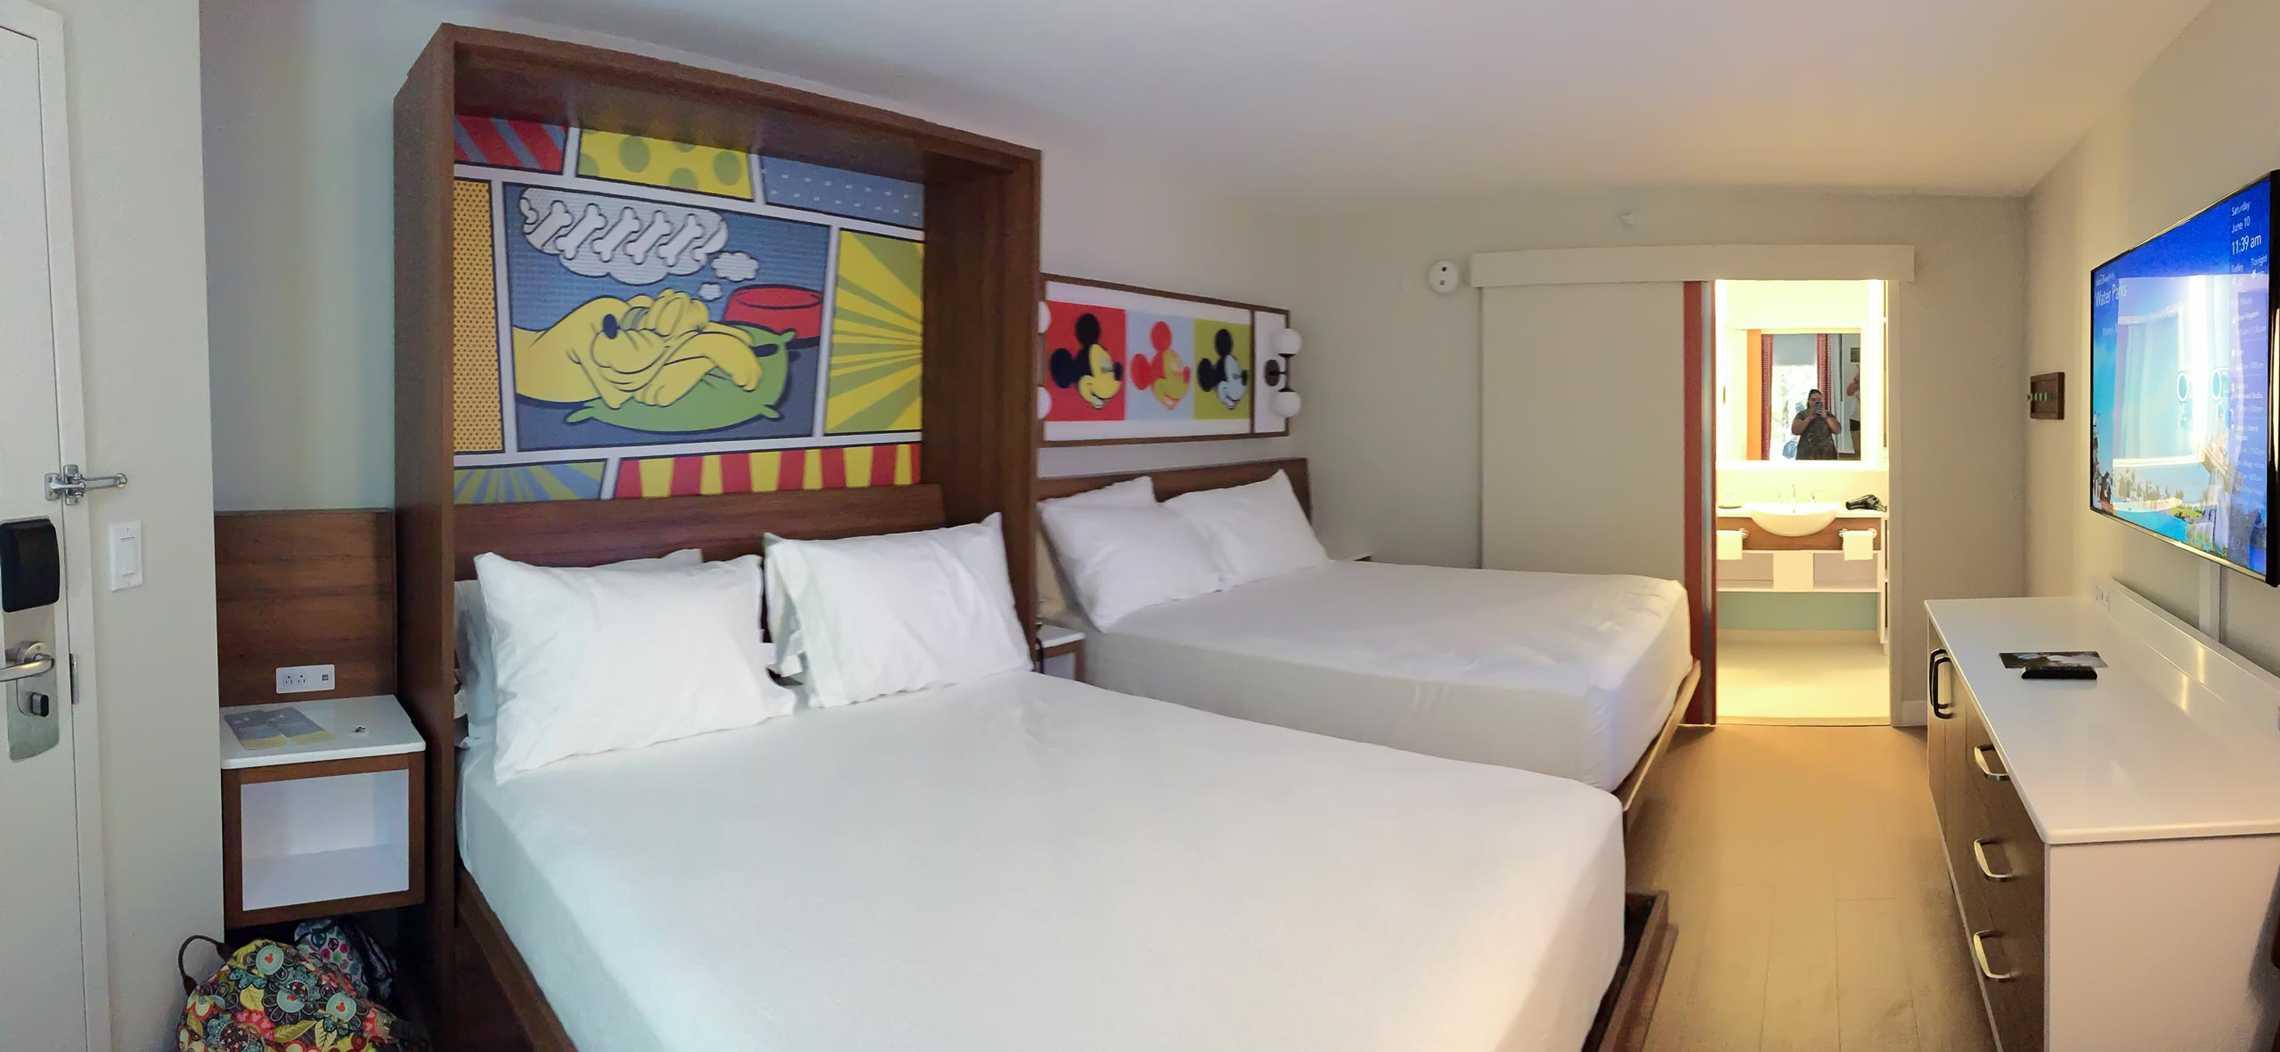 2017 Pop Century Resort room refurbishment